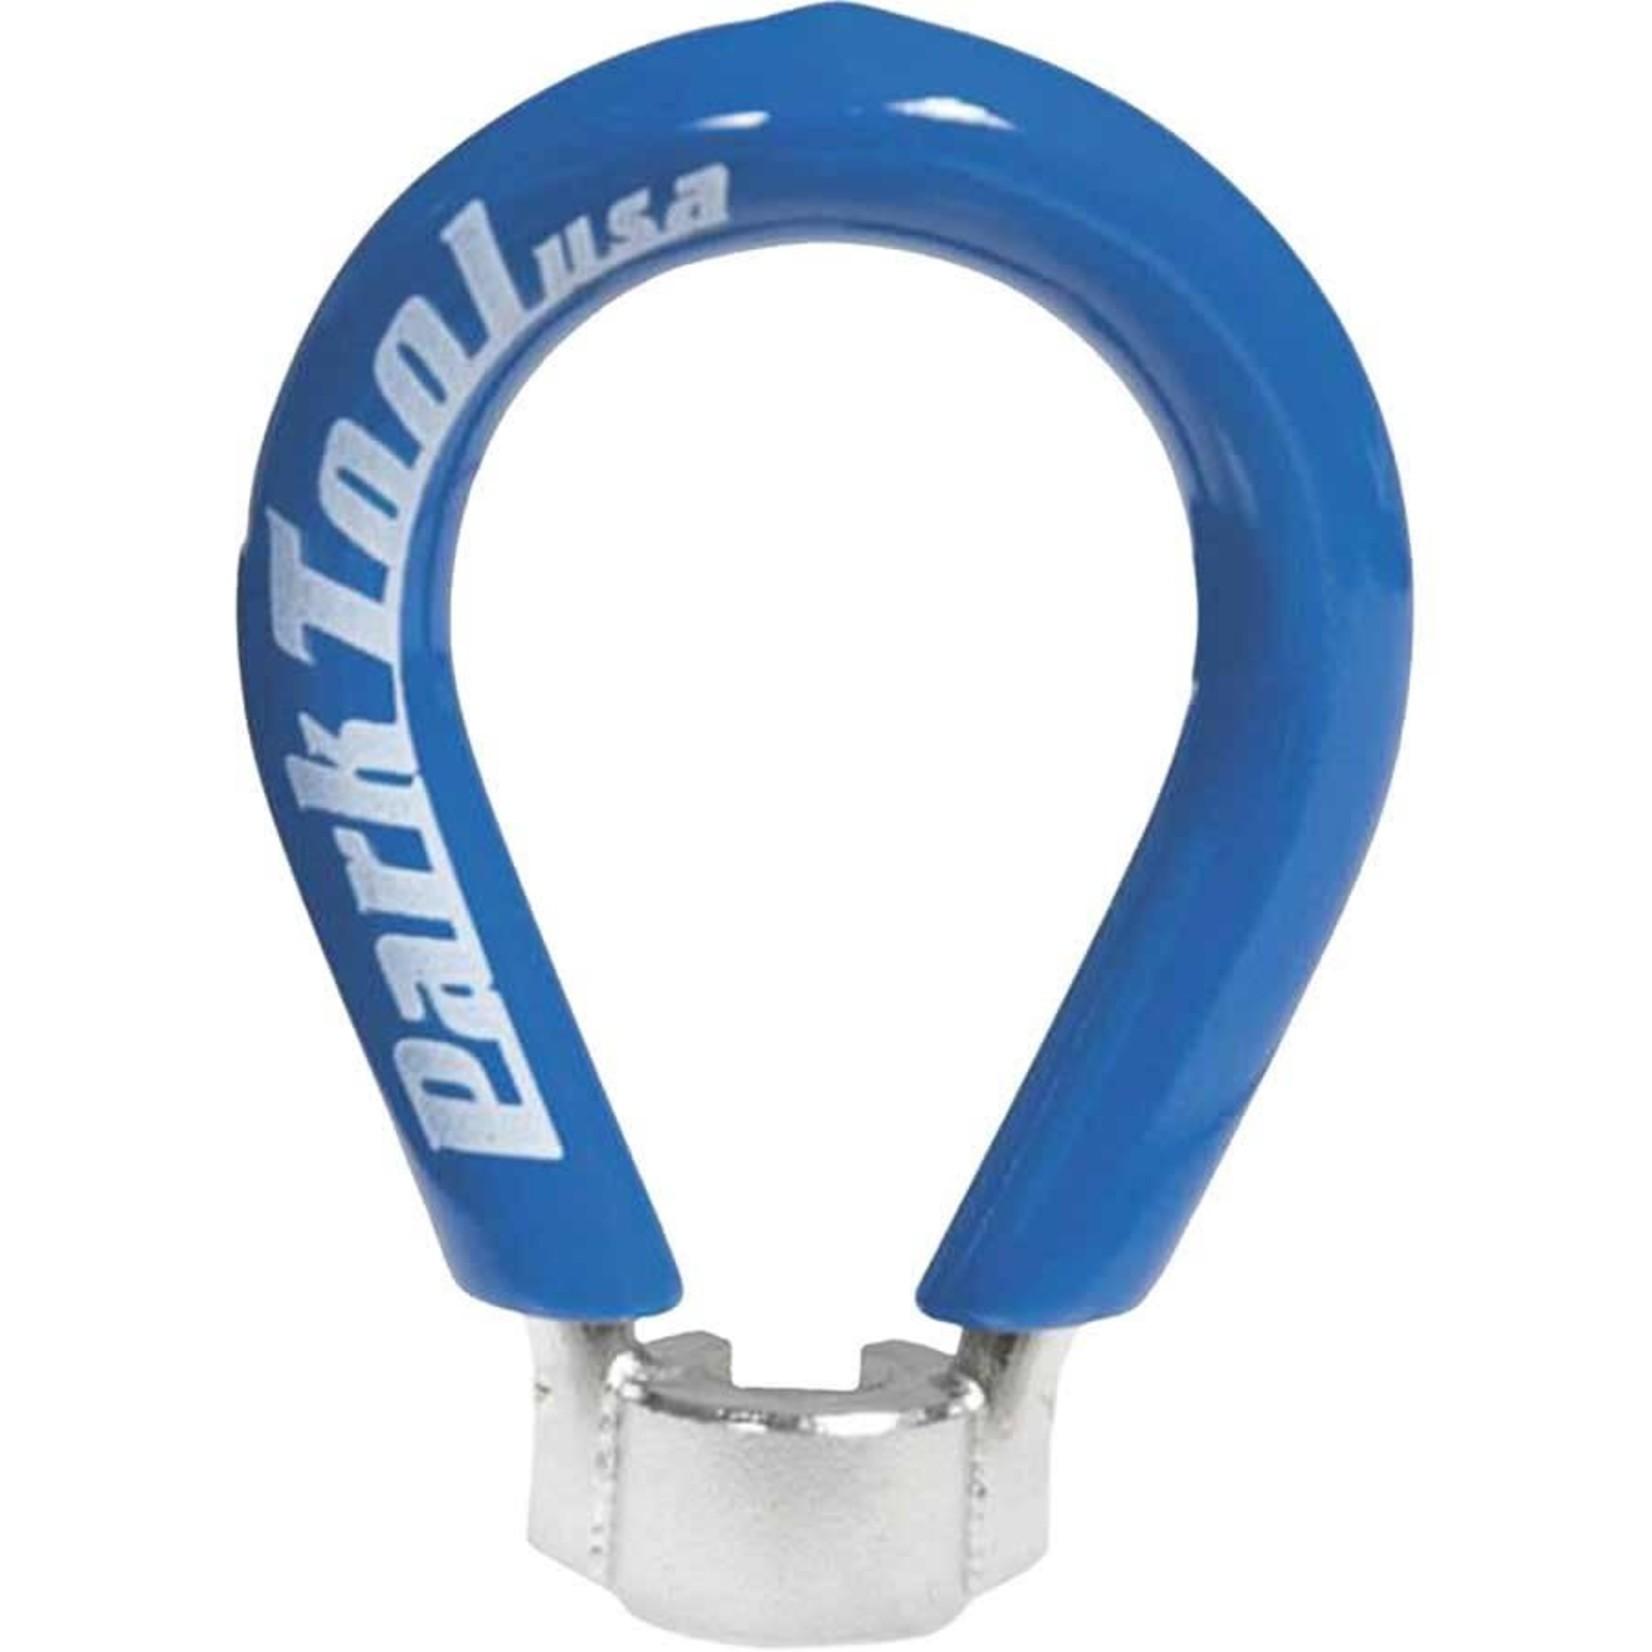 Park Tool Park Tool, SW-3, Clé à rayons, Bleu, 0.156''